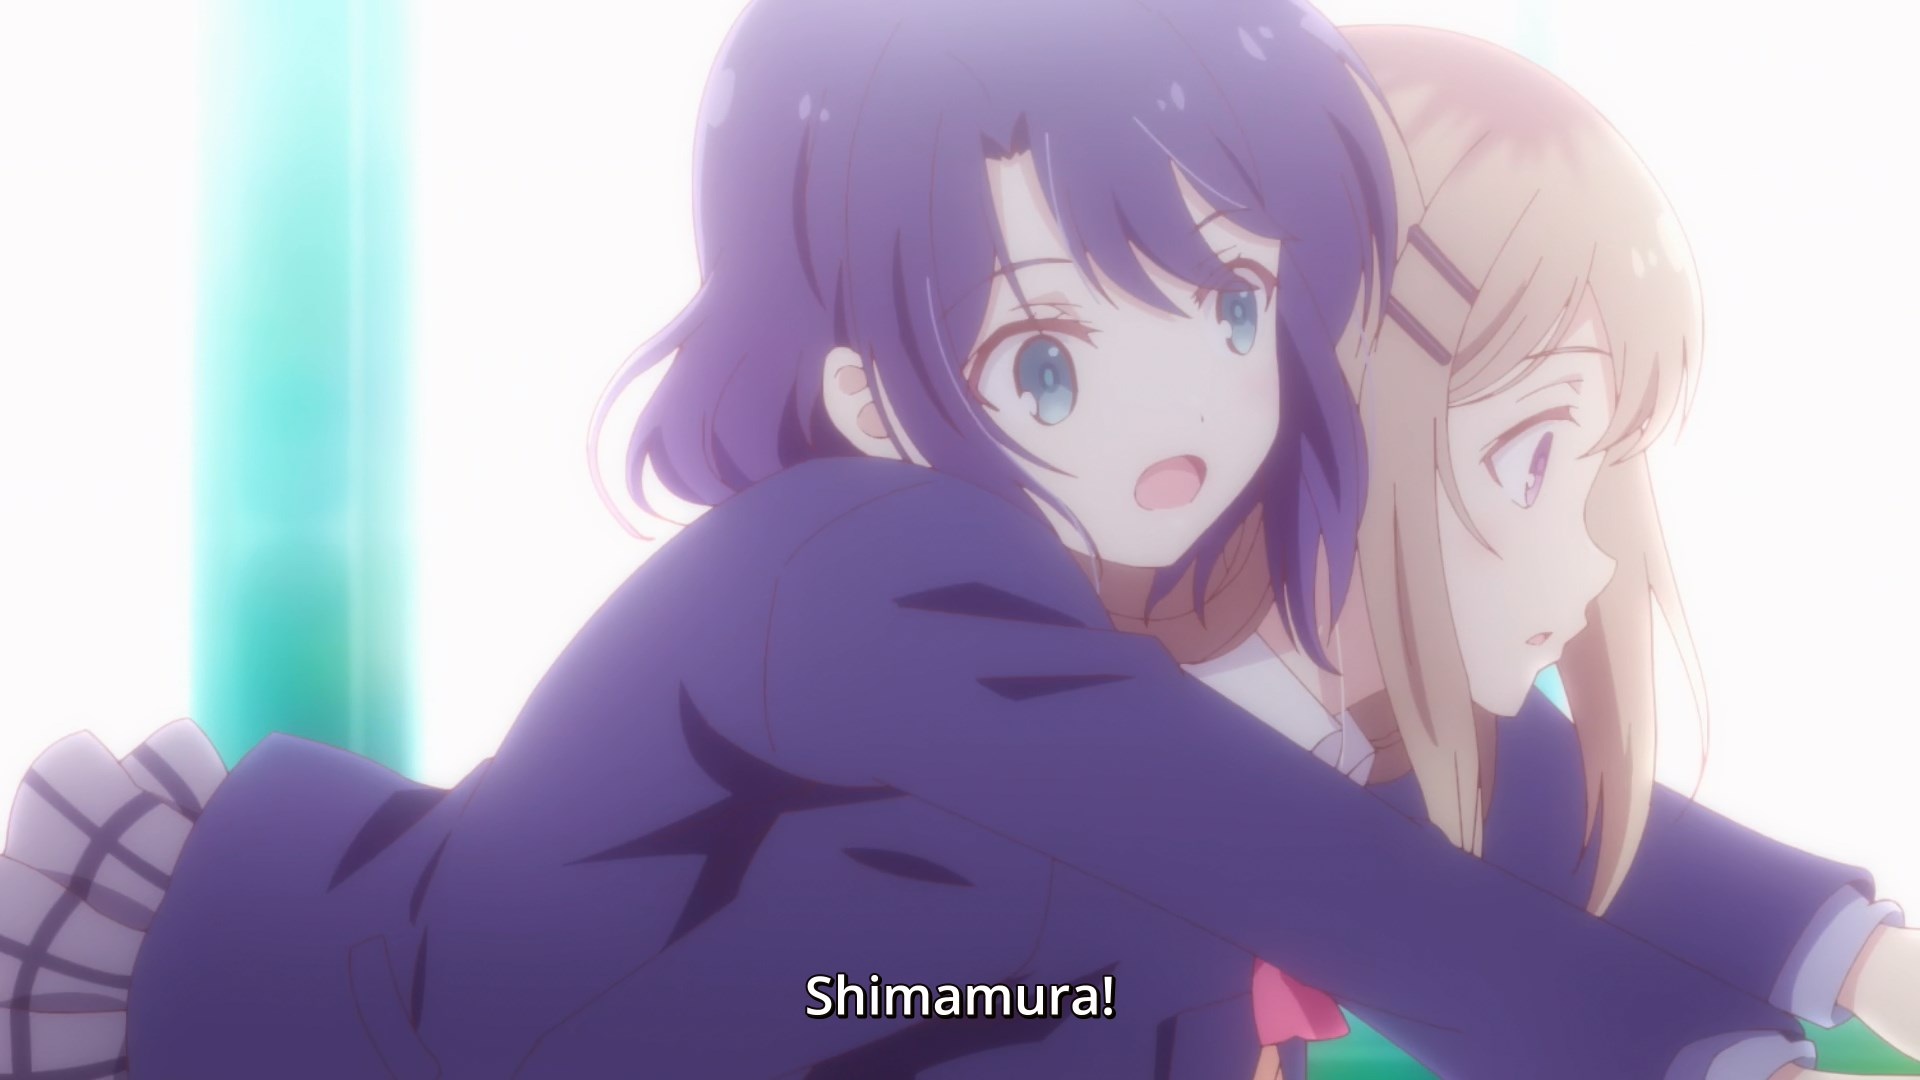 Adachi's dream relationship with Shimamura